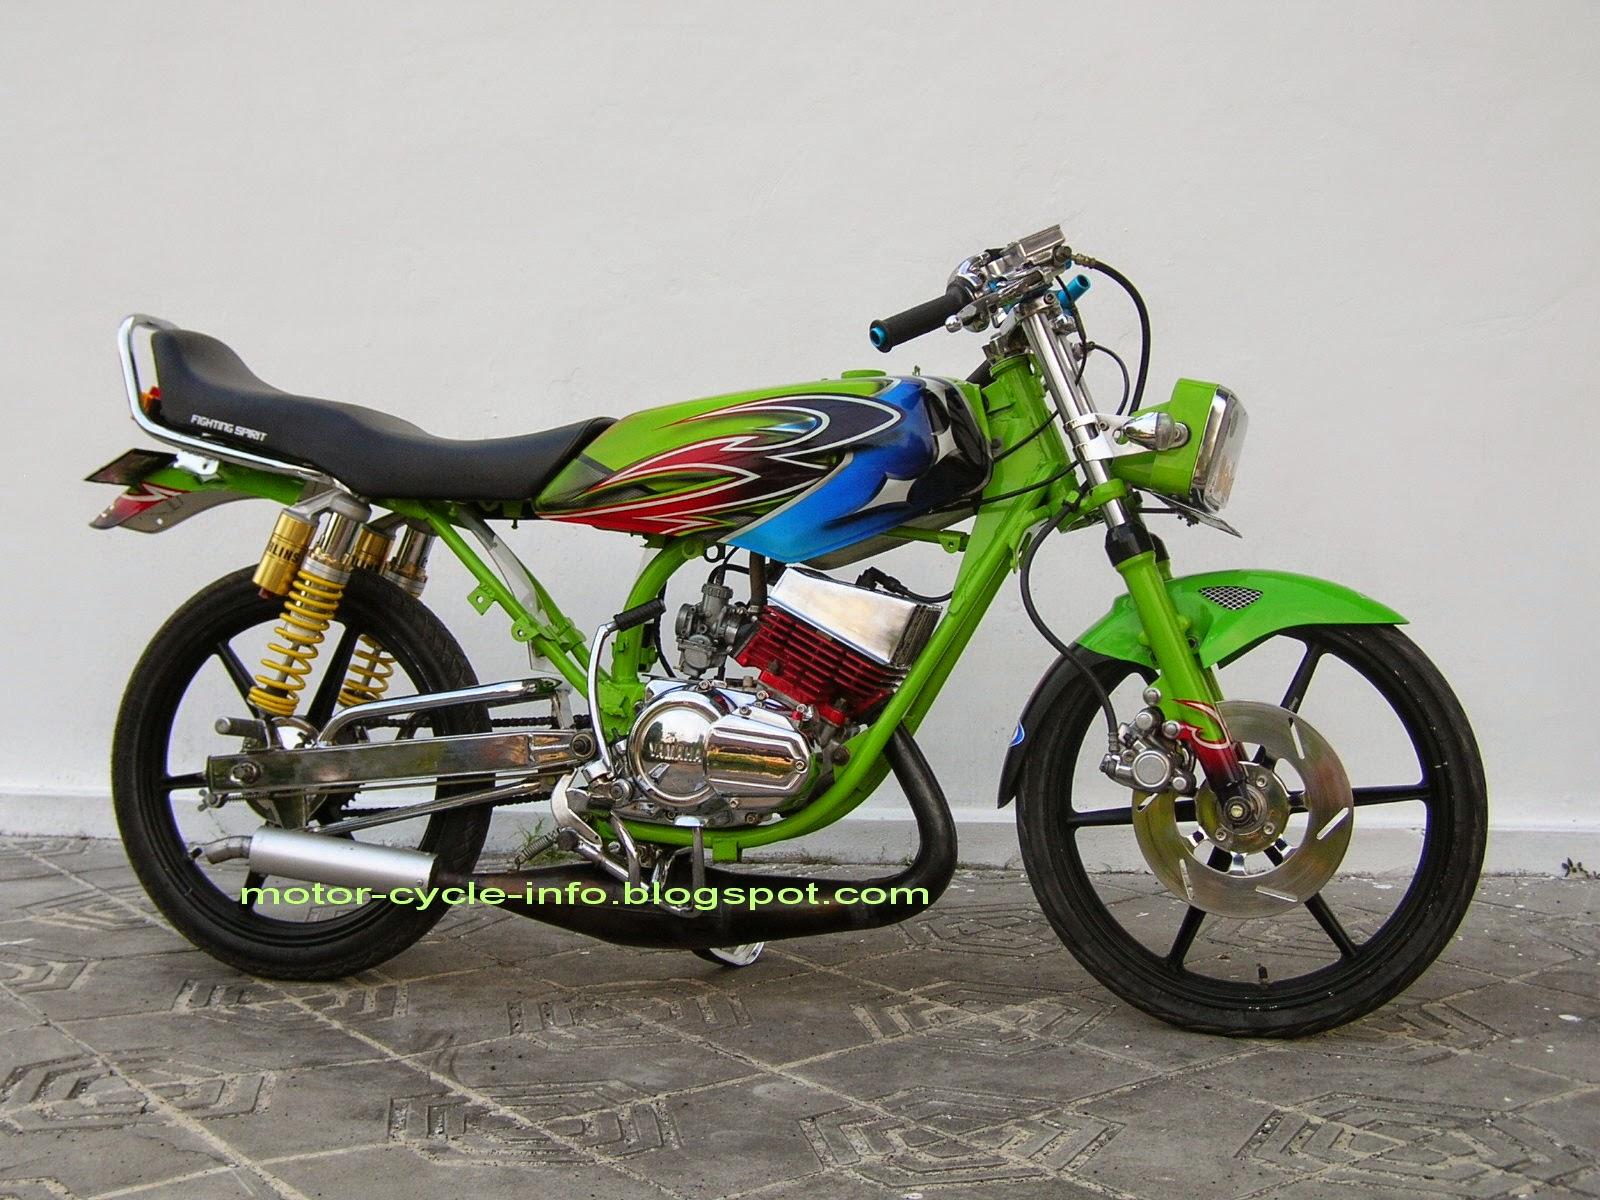 Modifikasi Motor Honda Blade Road Race  Thecitycyclist